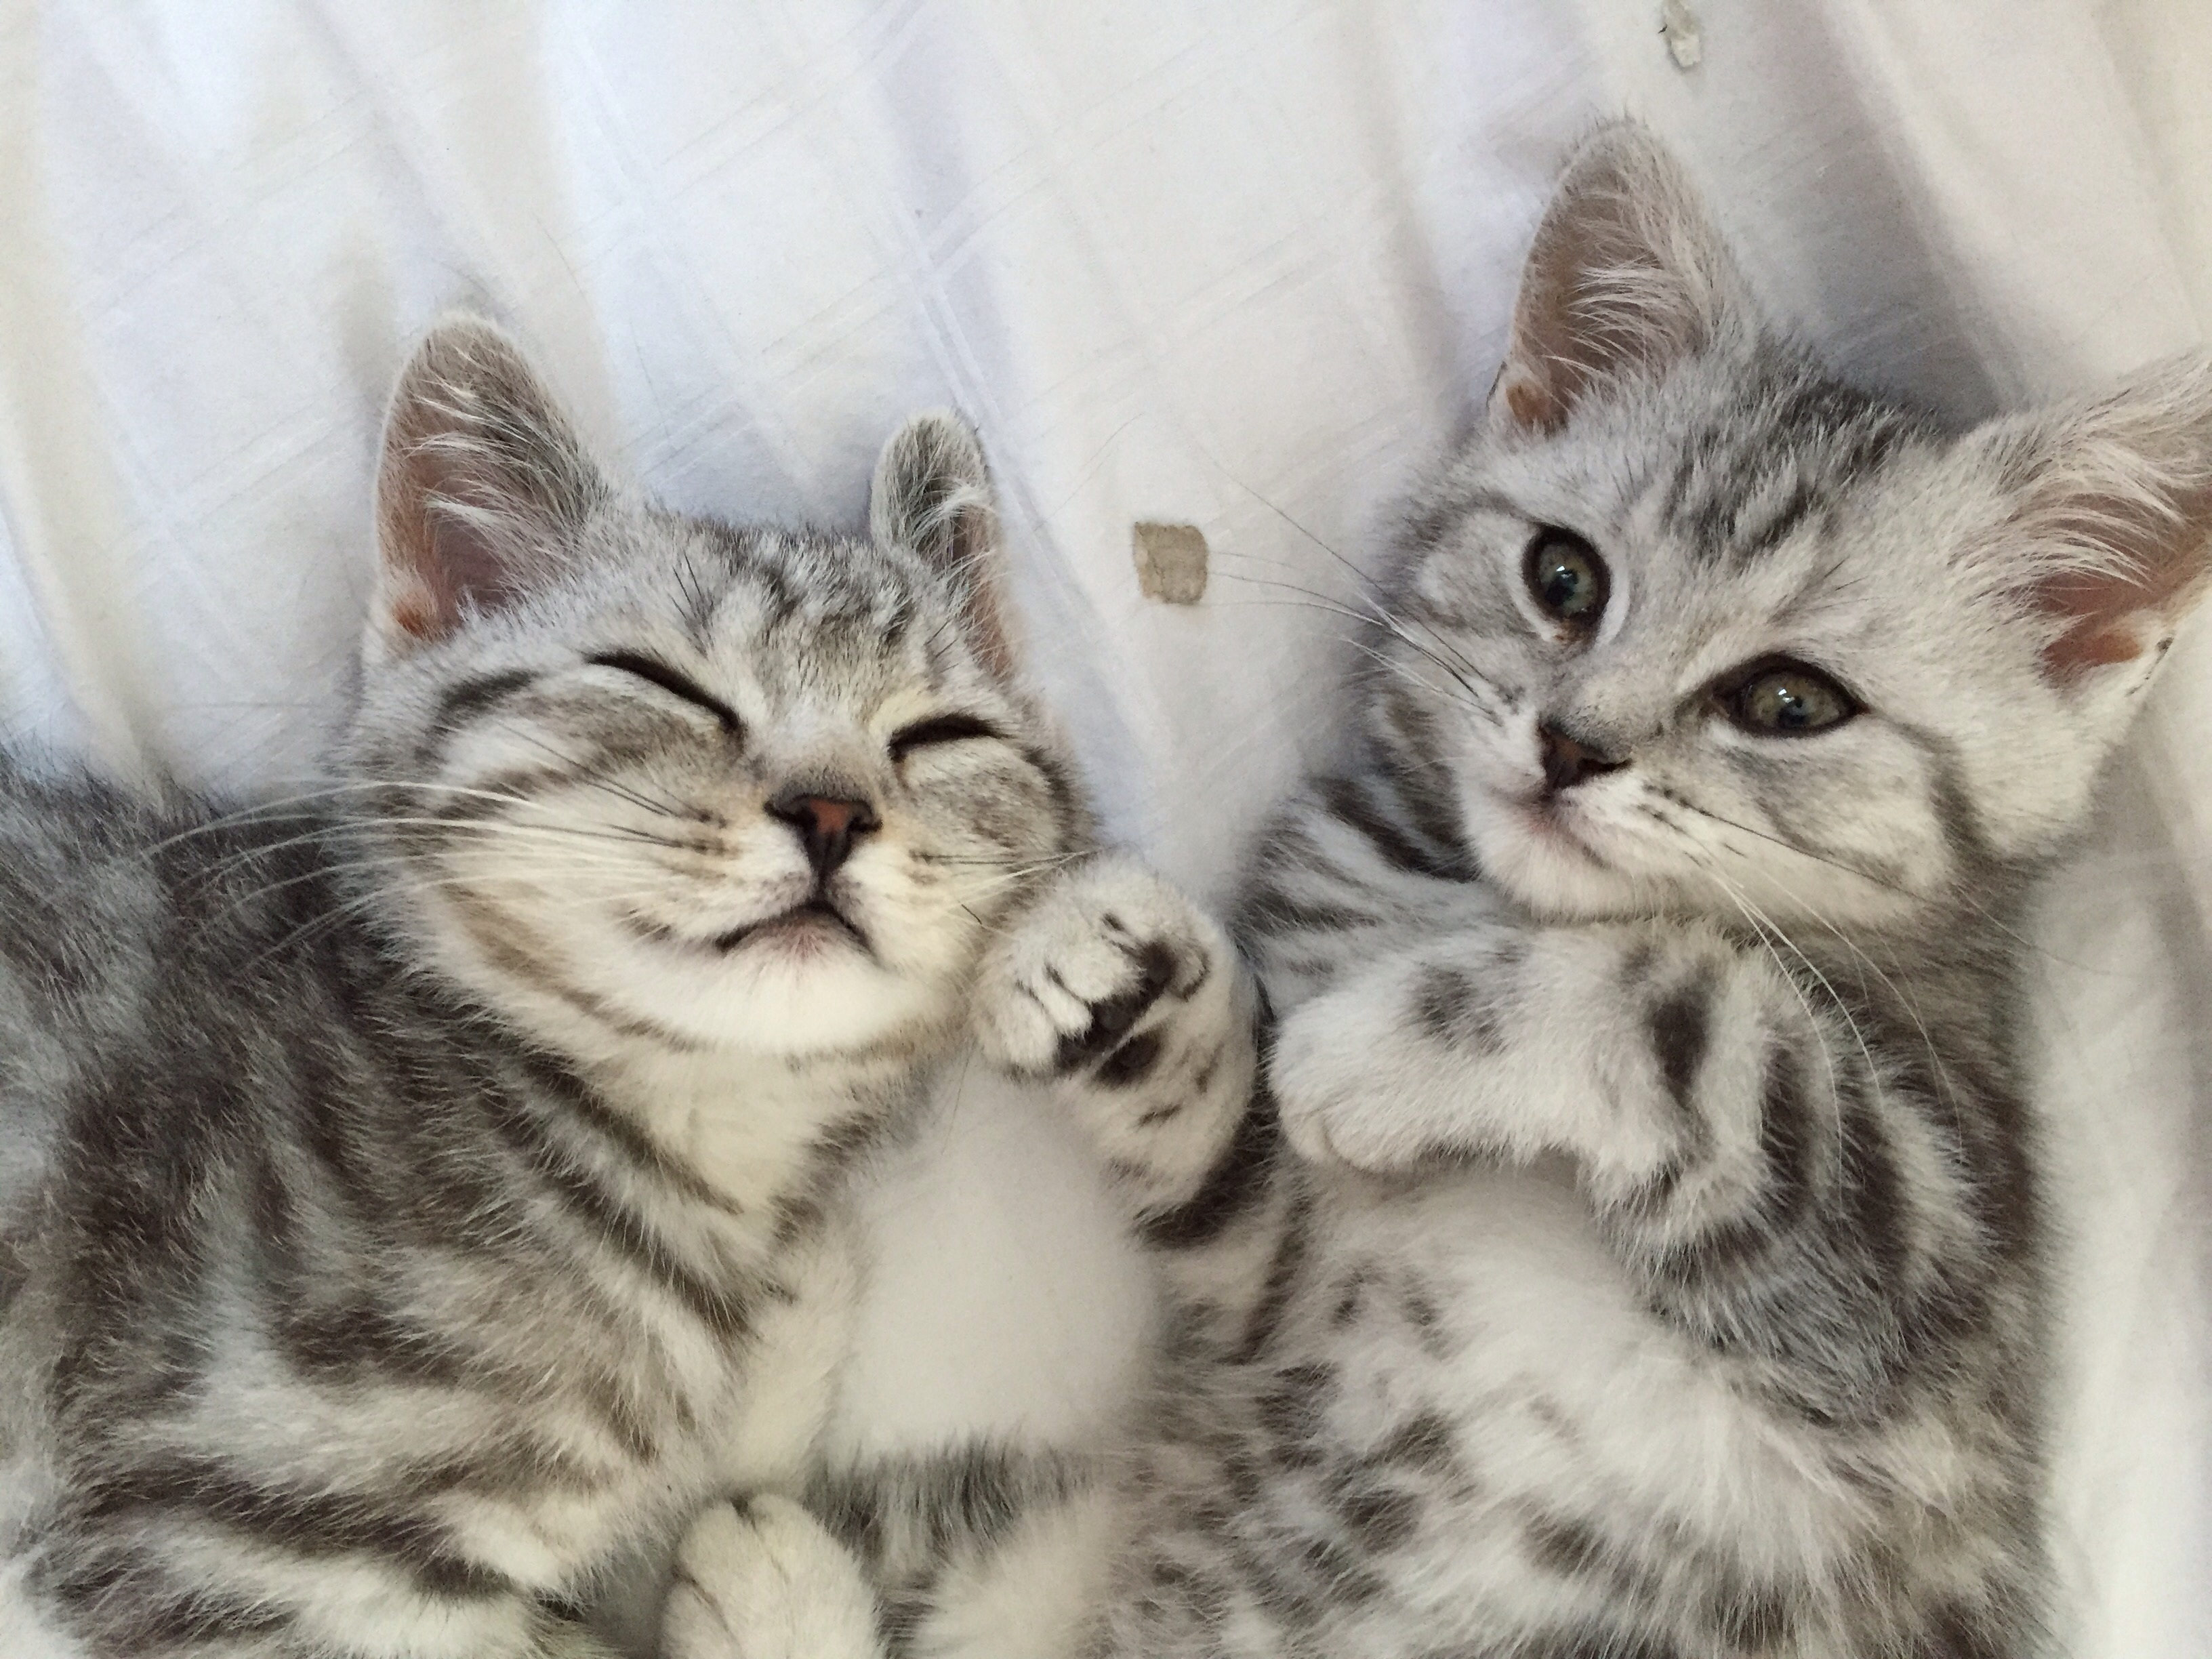 Frankie & Bennie